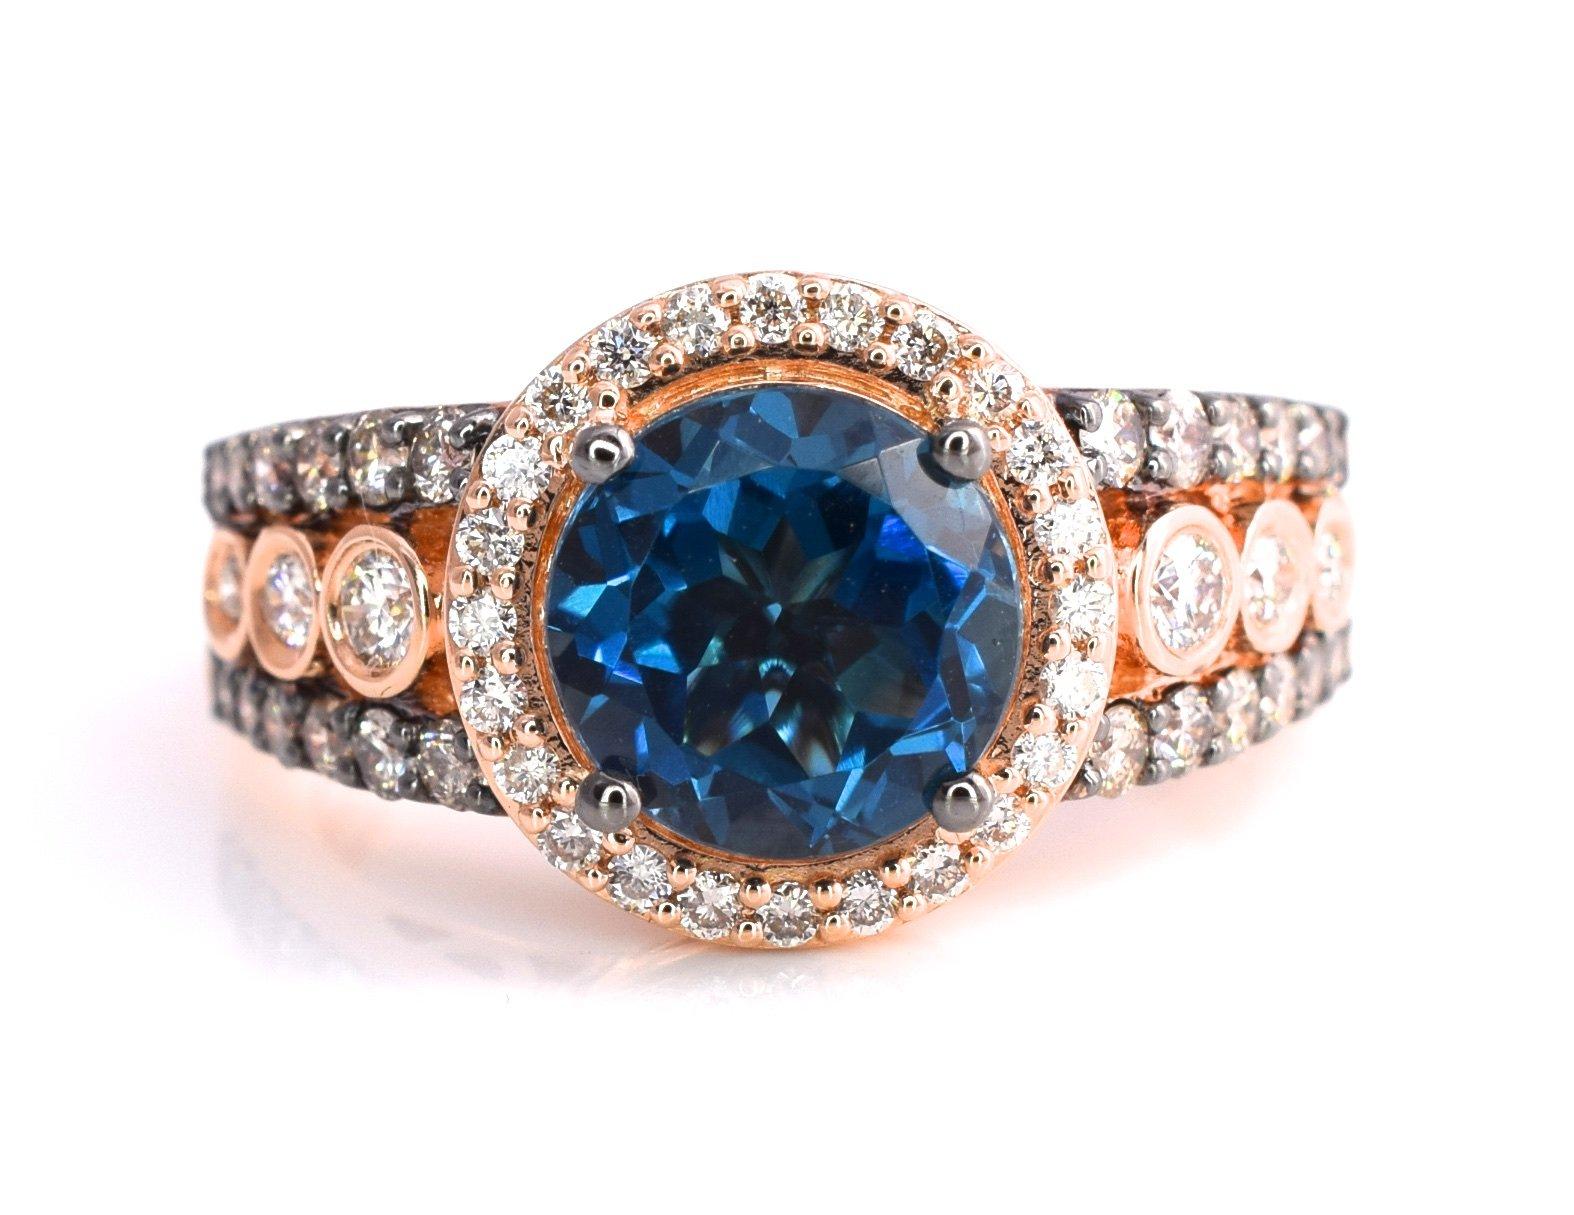 LeVian Deep Sea Blue Topaz Ring Chocolate and Vanilla Diamonds 2.67 cttw 14K Rose Gold Size 7